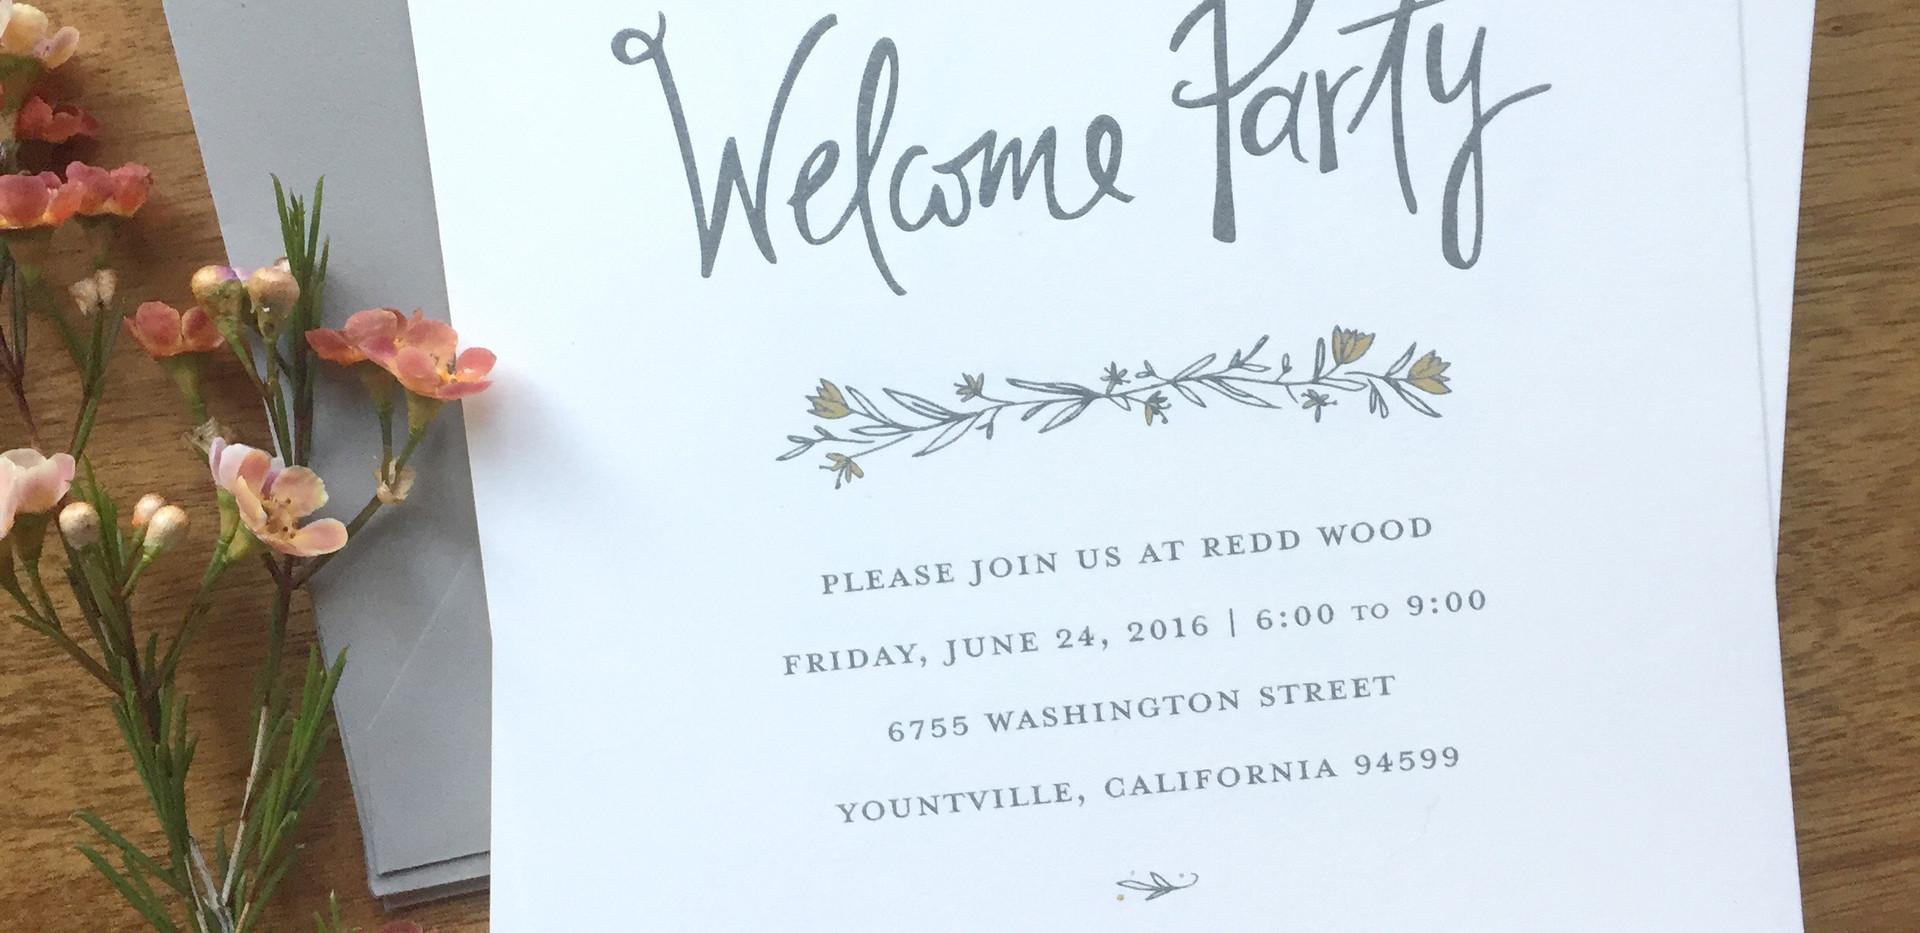 Napa Wildflower Wedding Welcome Party Invitation